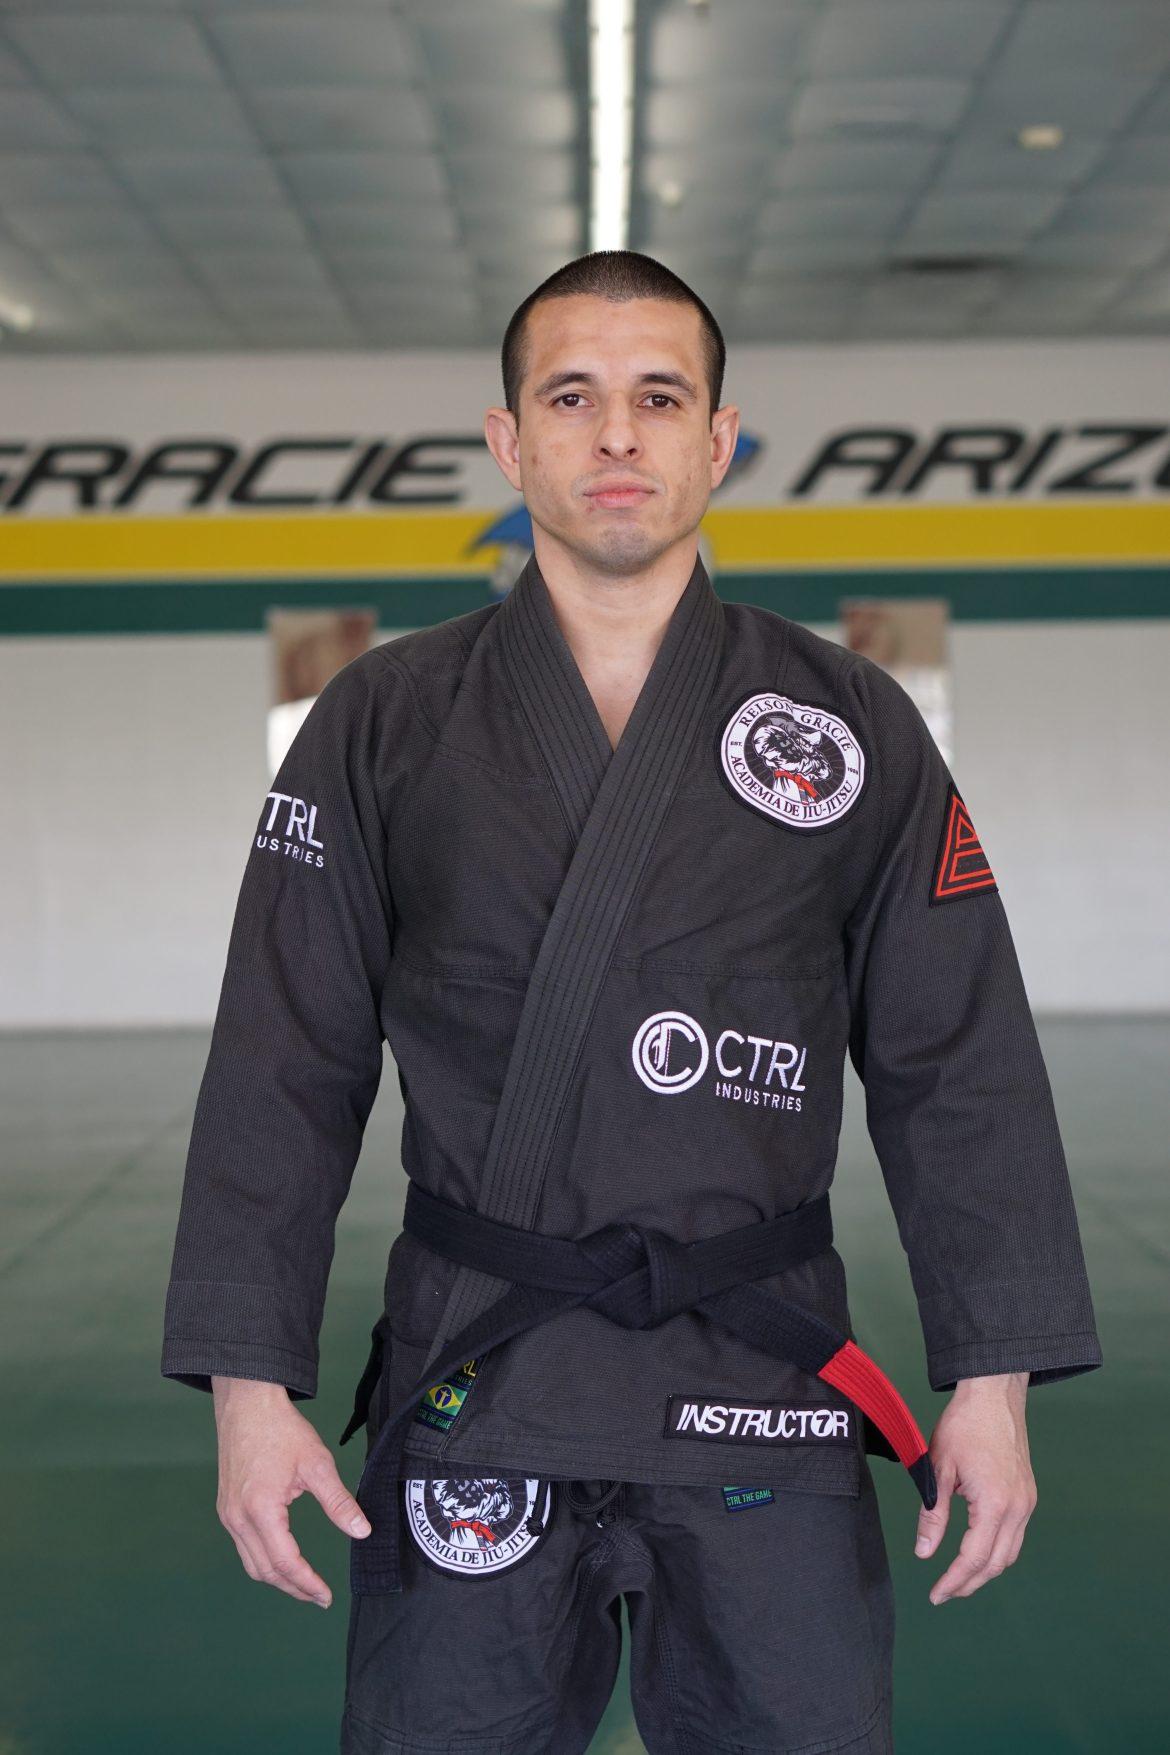 Antonio Berumen